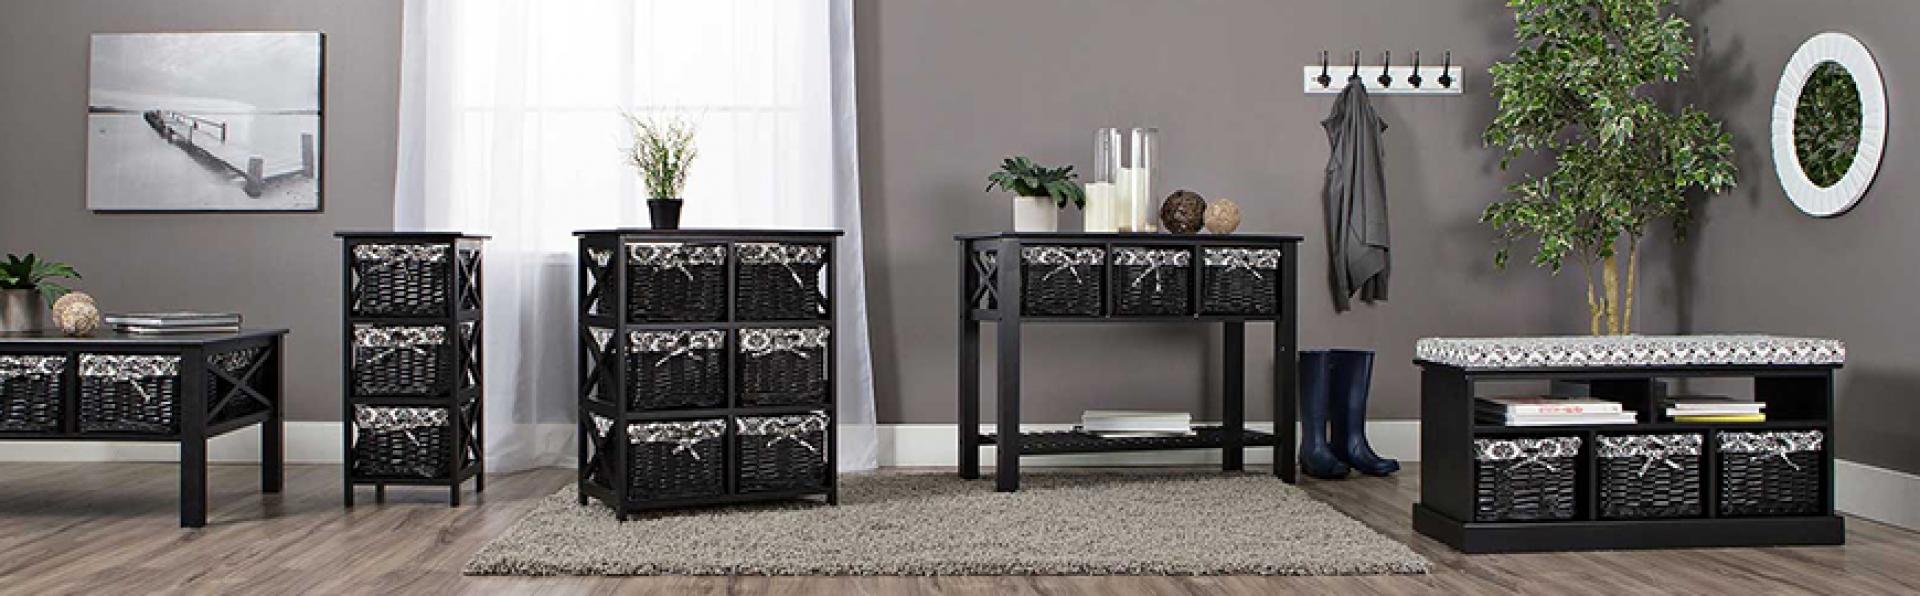 Storage Cabinet, Small Storage Cabinet, Large Storage Cabinet,